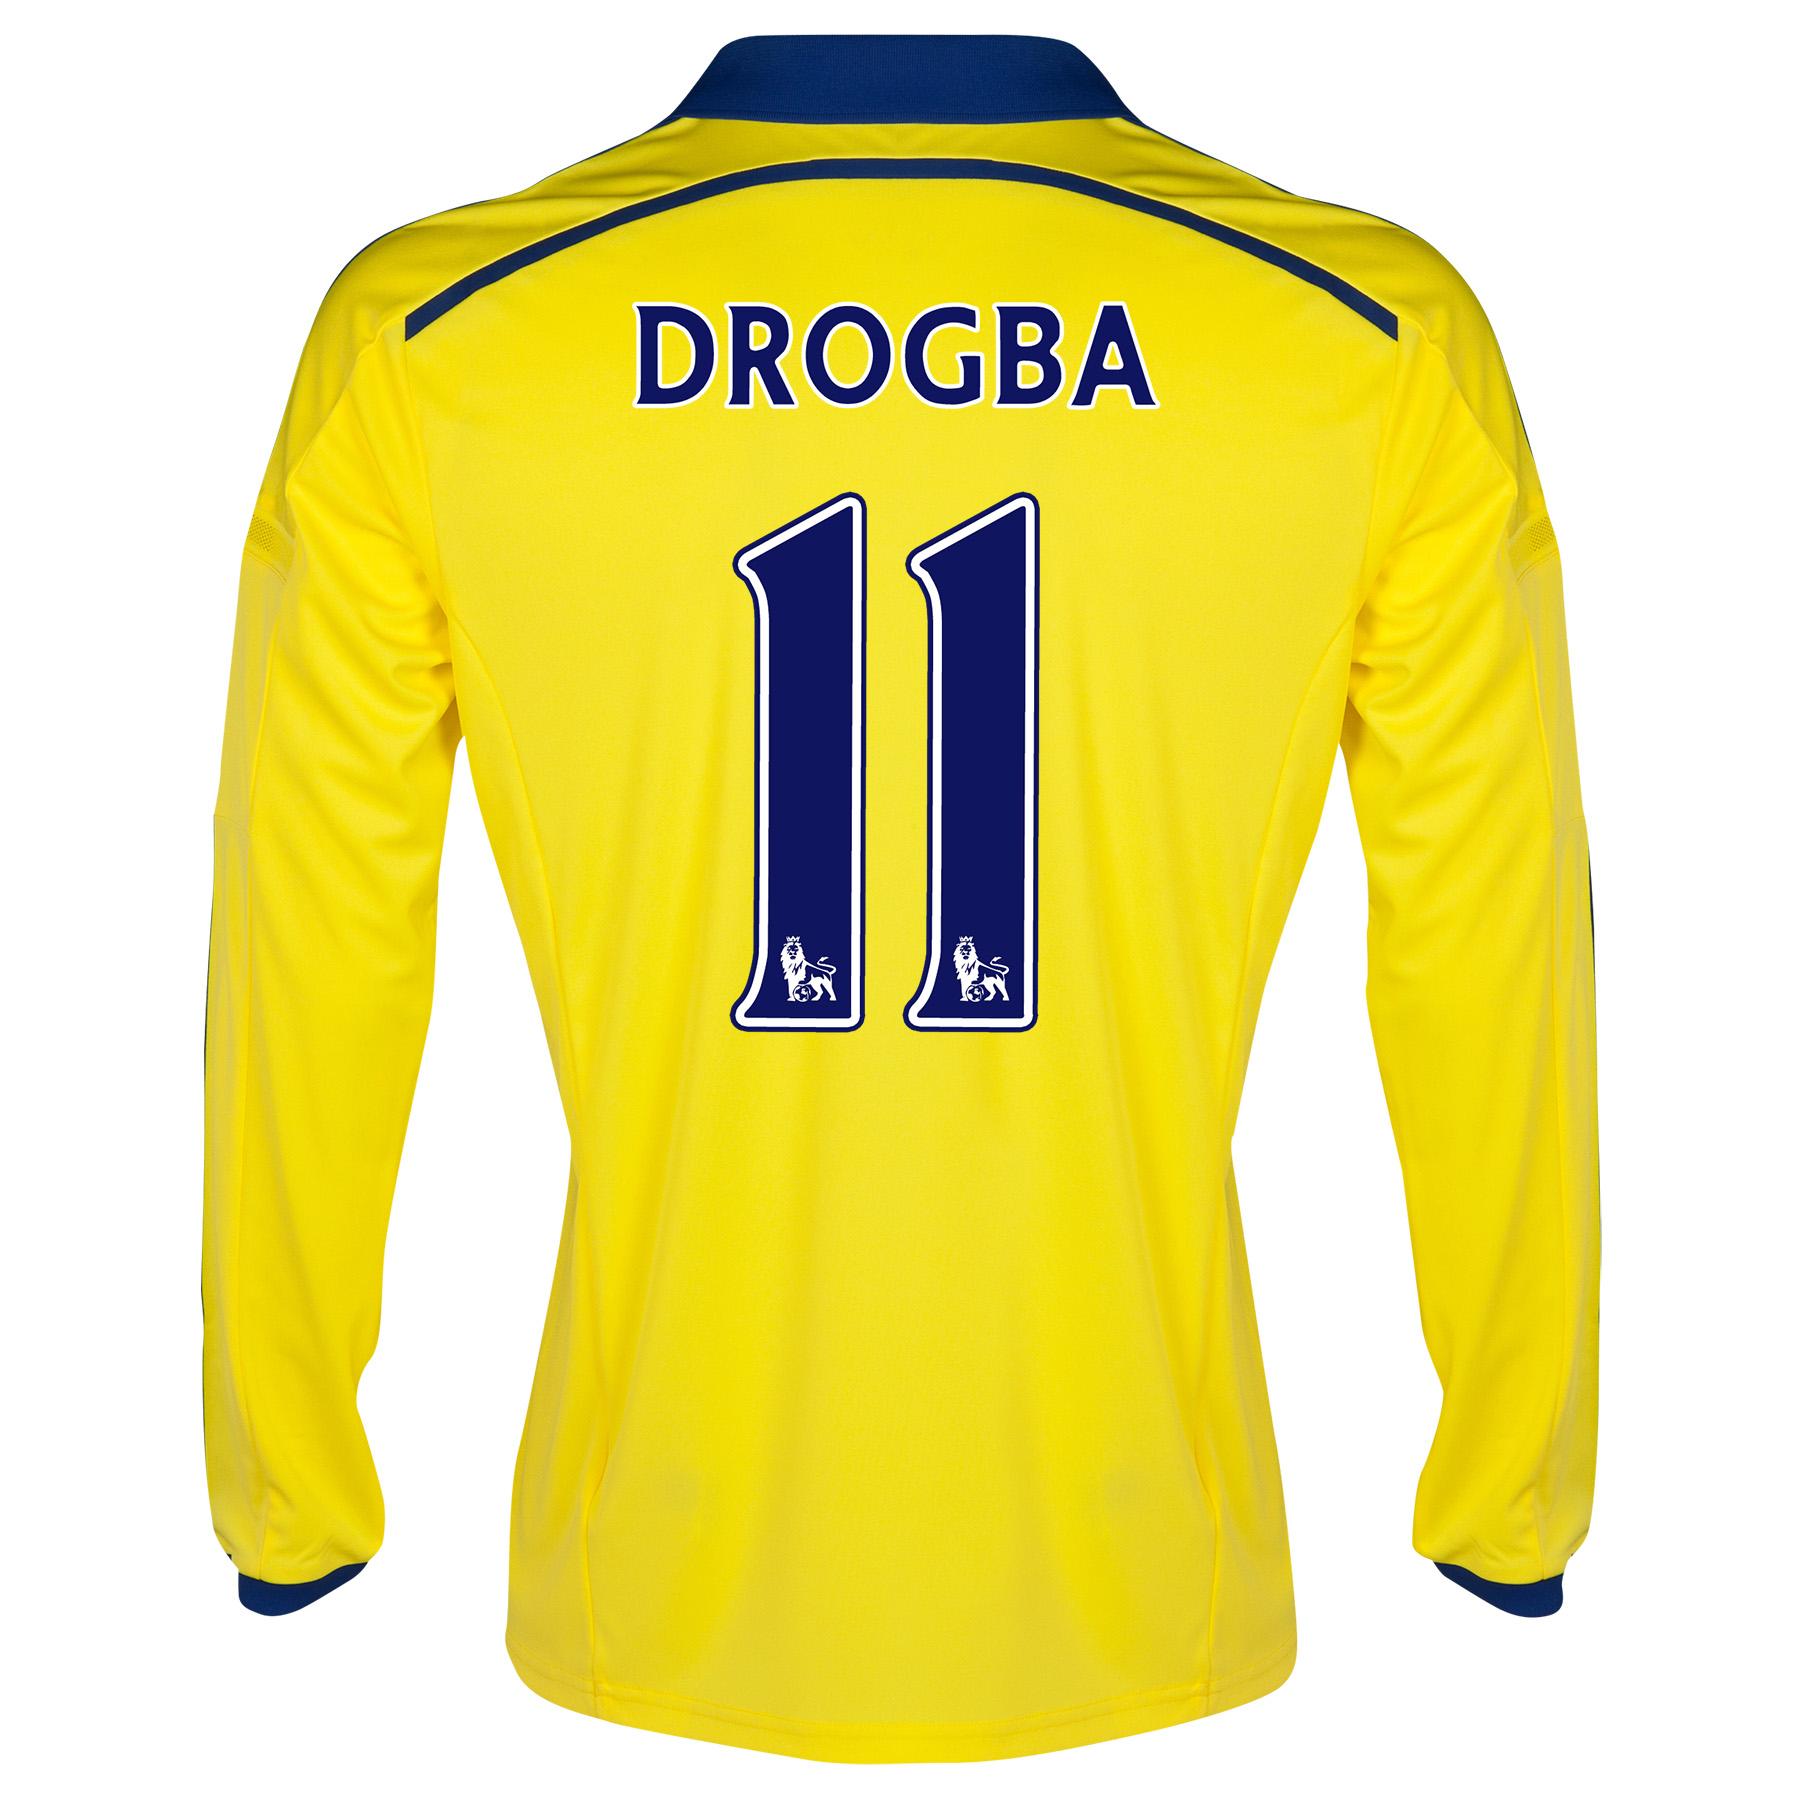 Chelsea Away Shirt 2014/15 - Long Sleeve with Drogba 11 printing